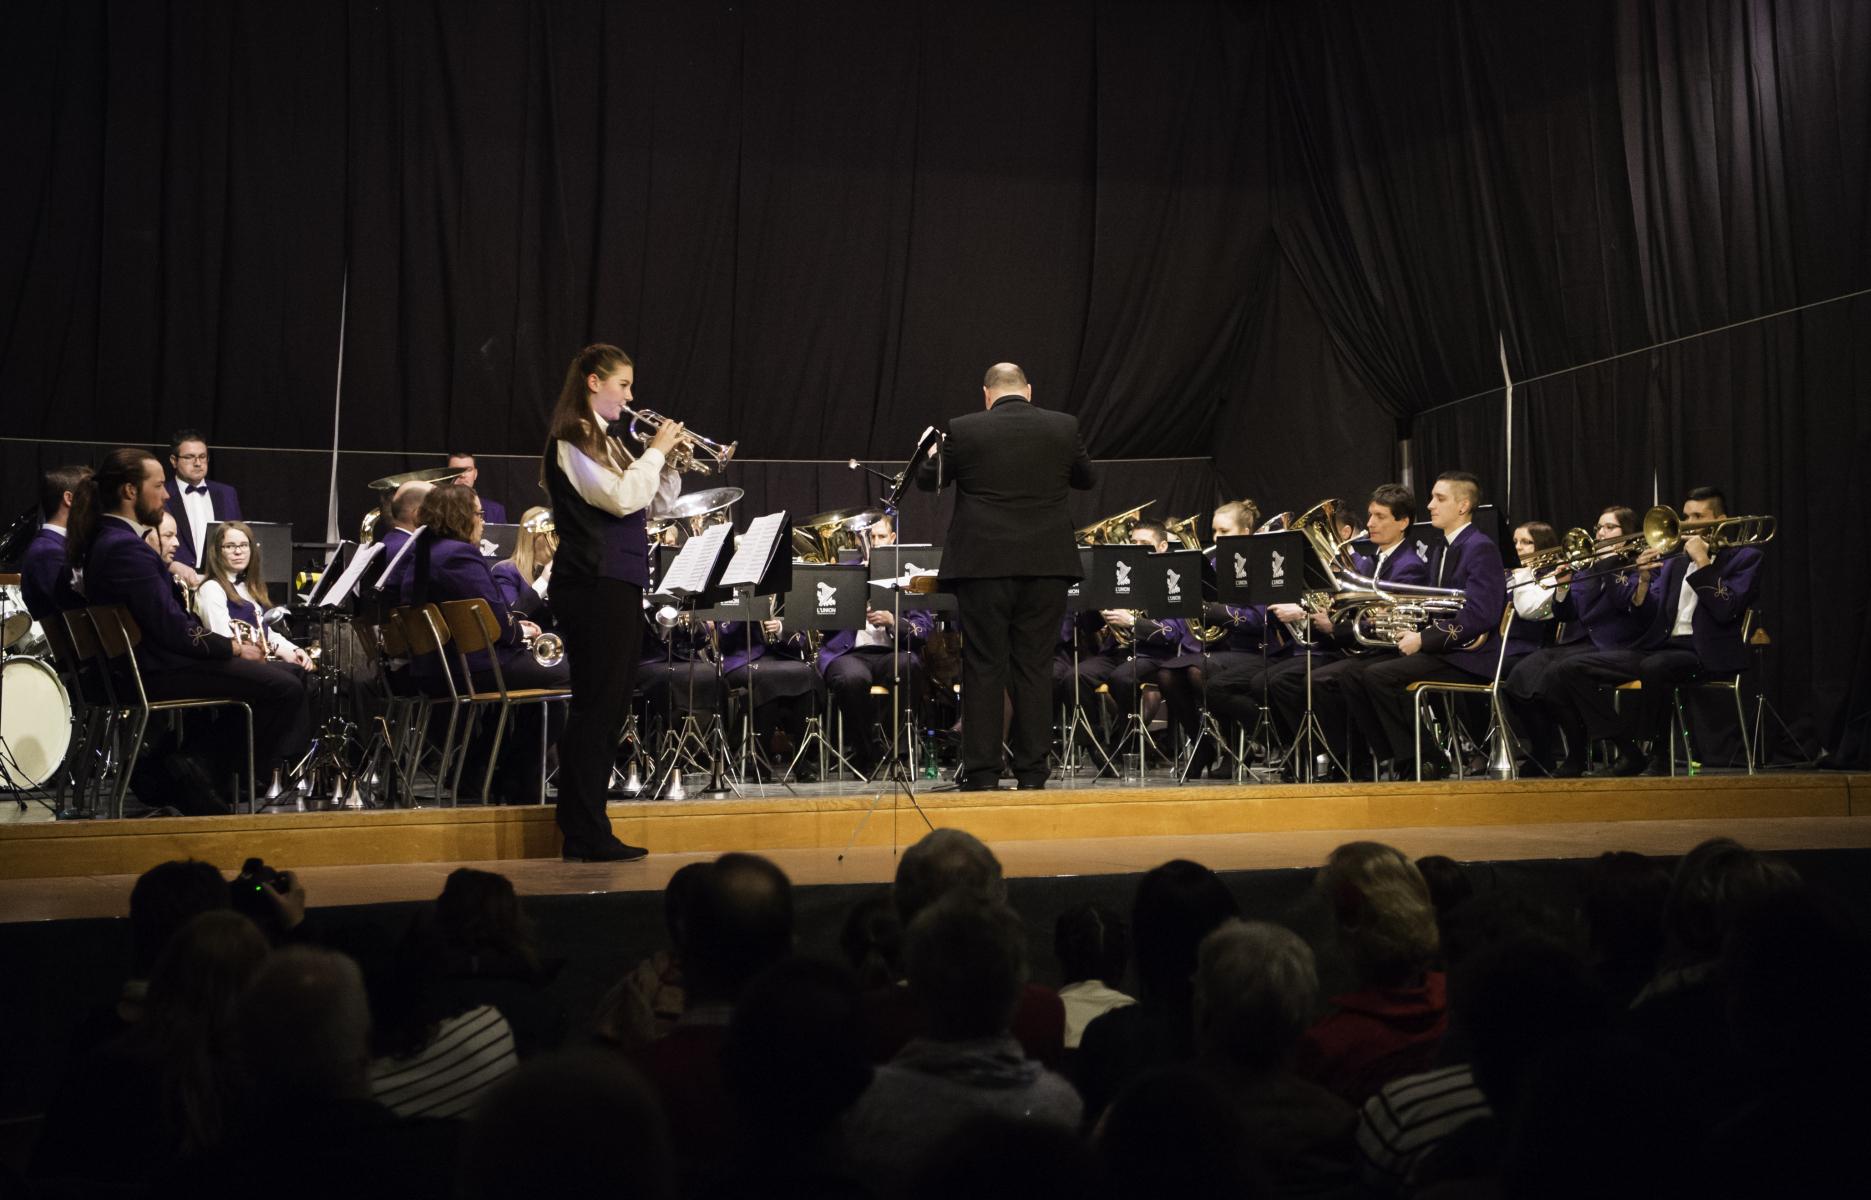 170211_concert_annuel17-058